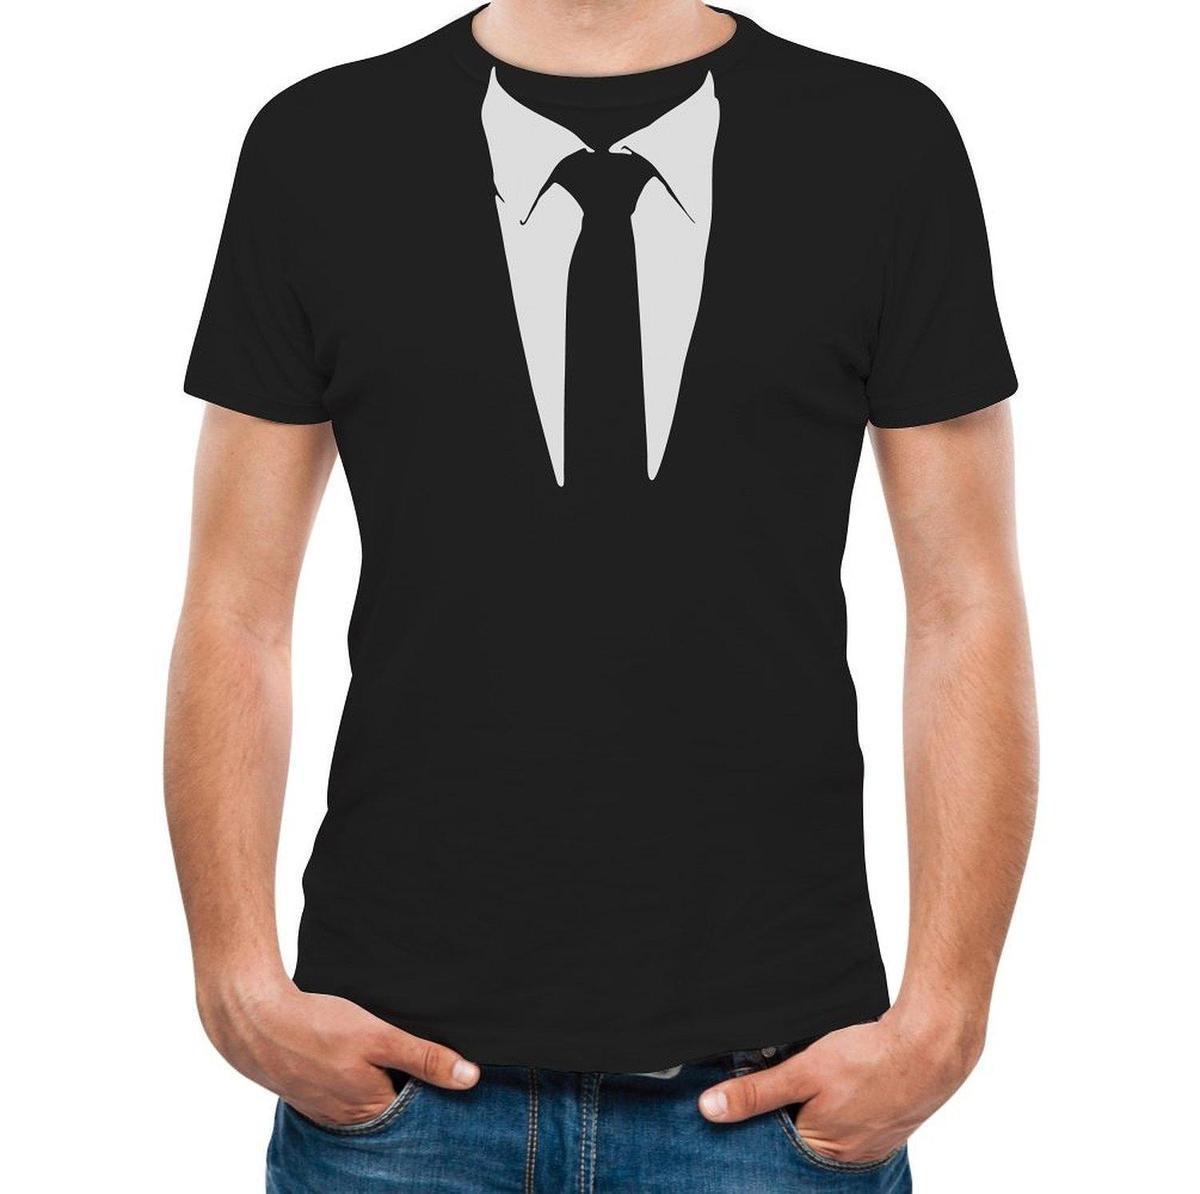 Printed Tee Shirt Design Printed Suit Tie Tuxedo Mens T Shirt